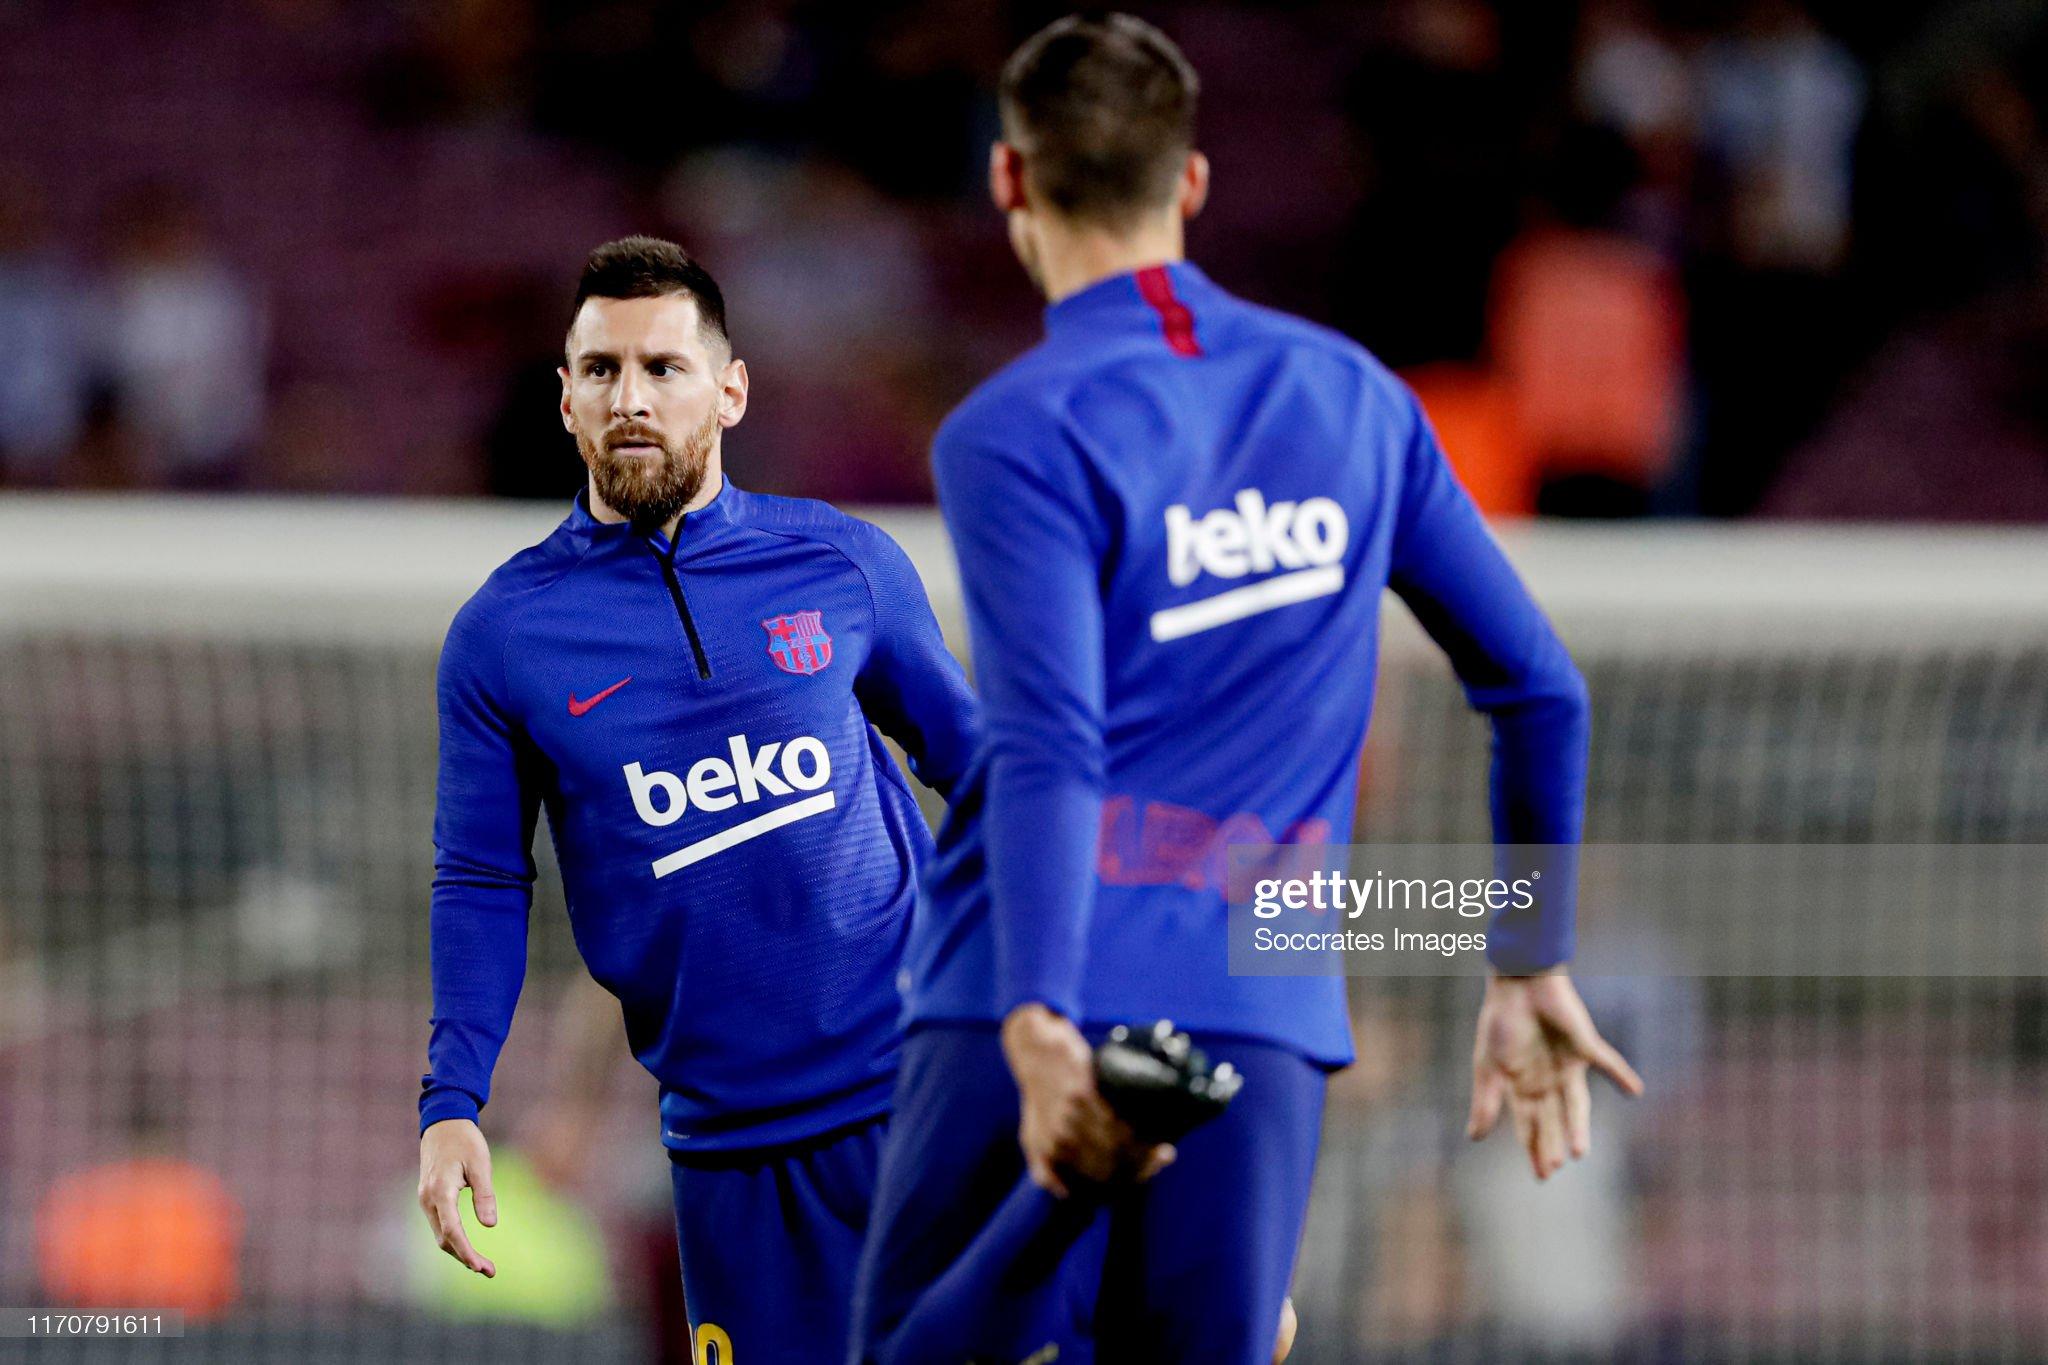 صور مباراة : برشلونة - فياريال 2-1 ( 24-09-2019 )  Lionel-messi-of-fc-barcelona-during-the-la-liga-santander-match-fc-picture-id1170791611?s=2048x2048